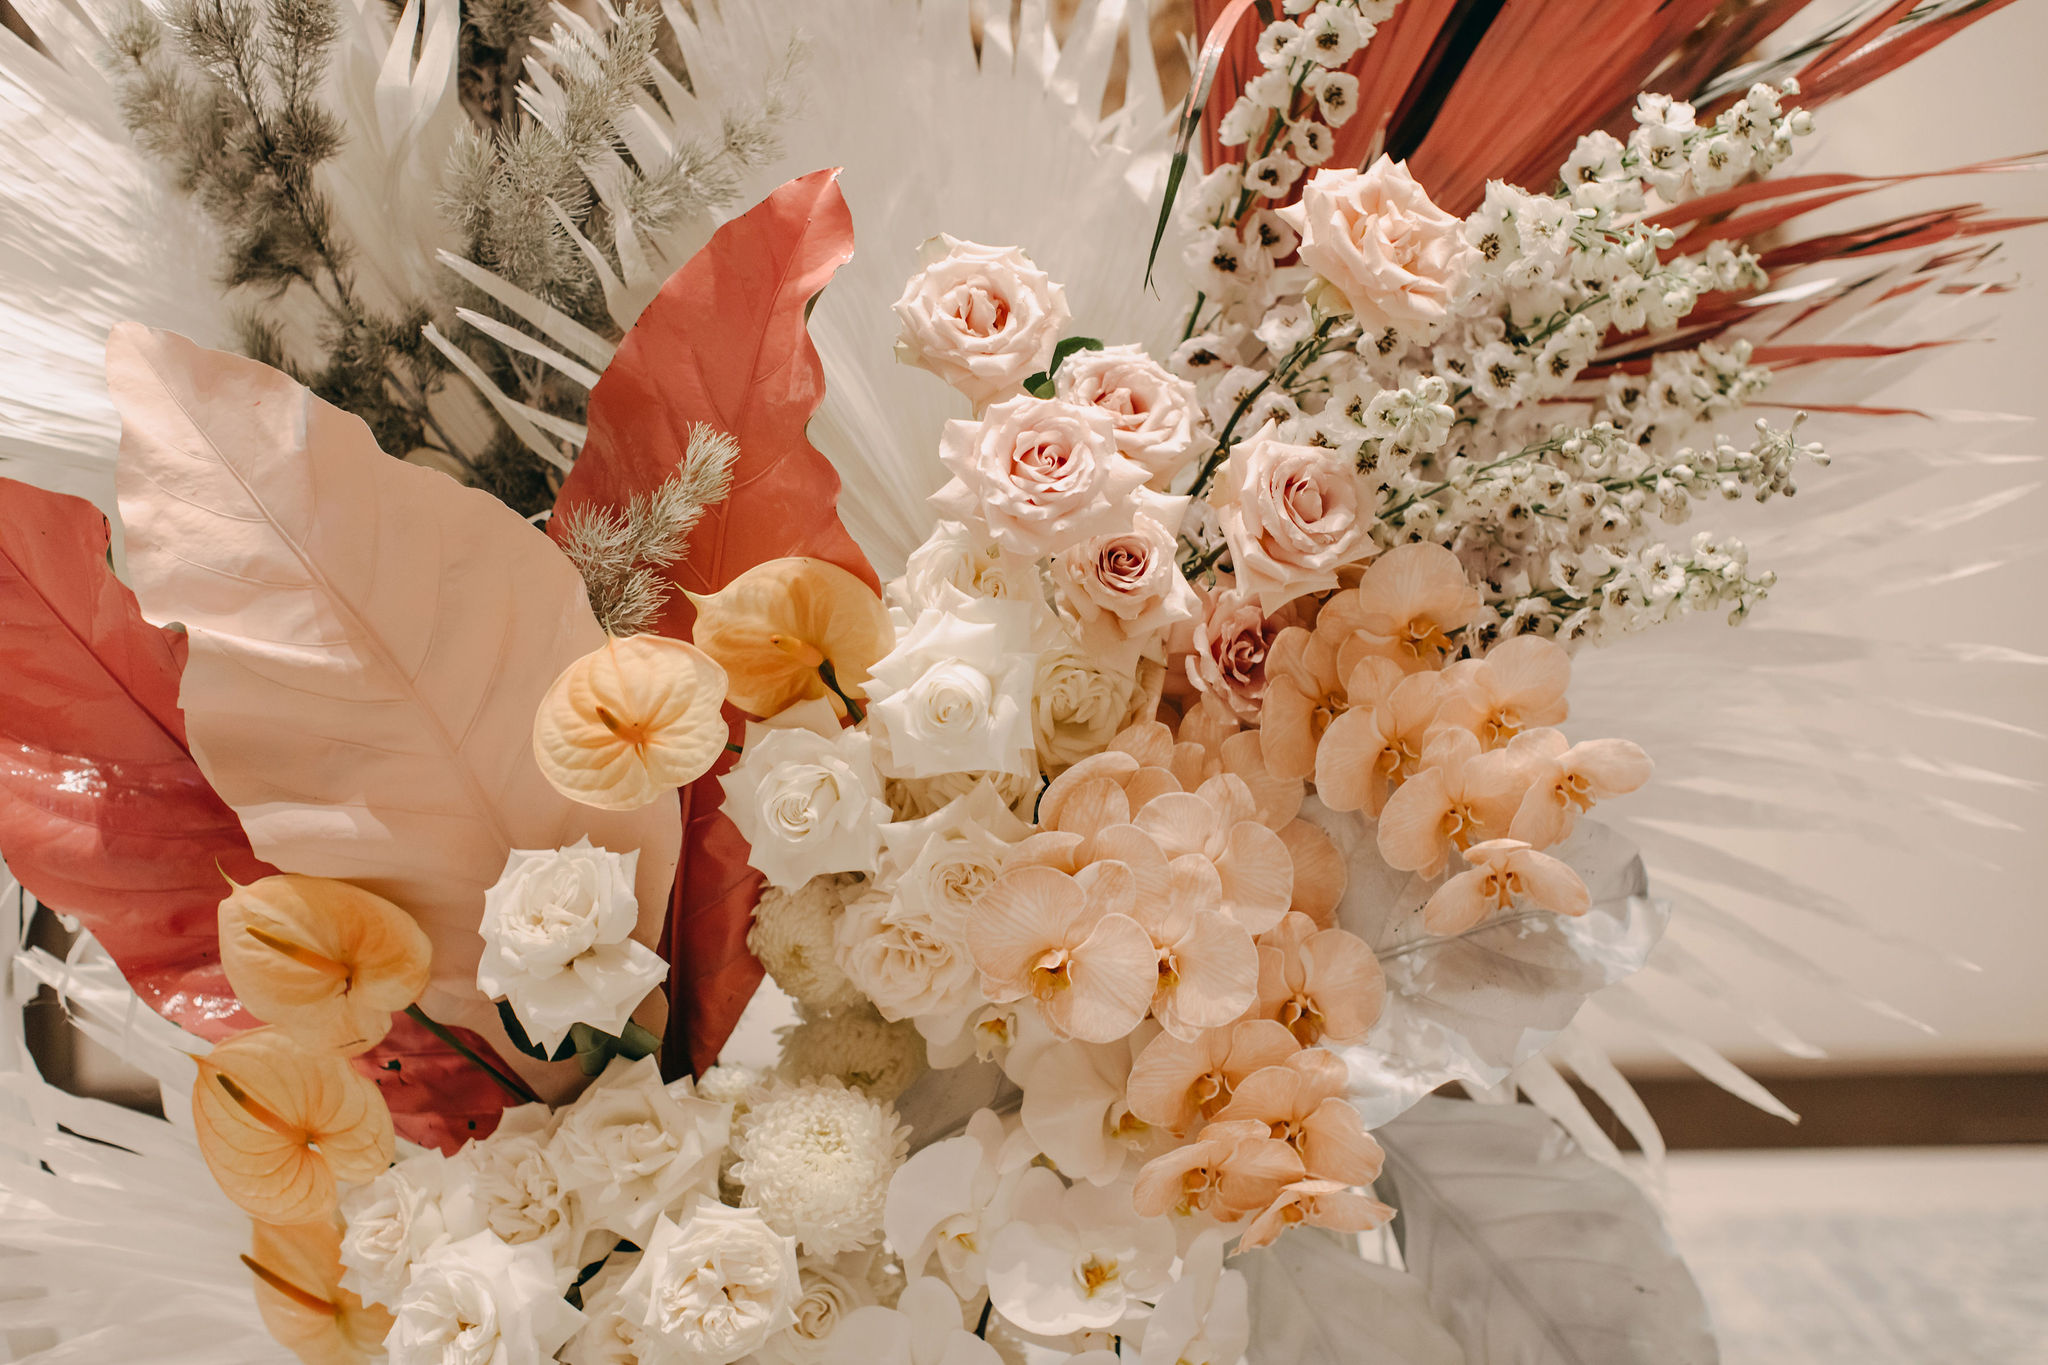 6-FOX&RABBIT-WEDDINGOPENDAY-THEWESTIN-15FEB2020